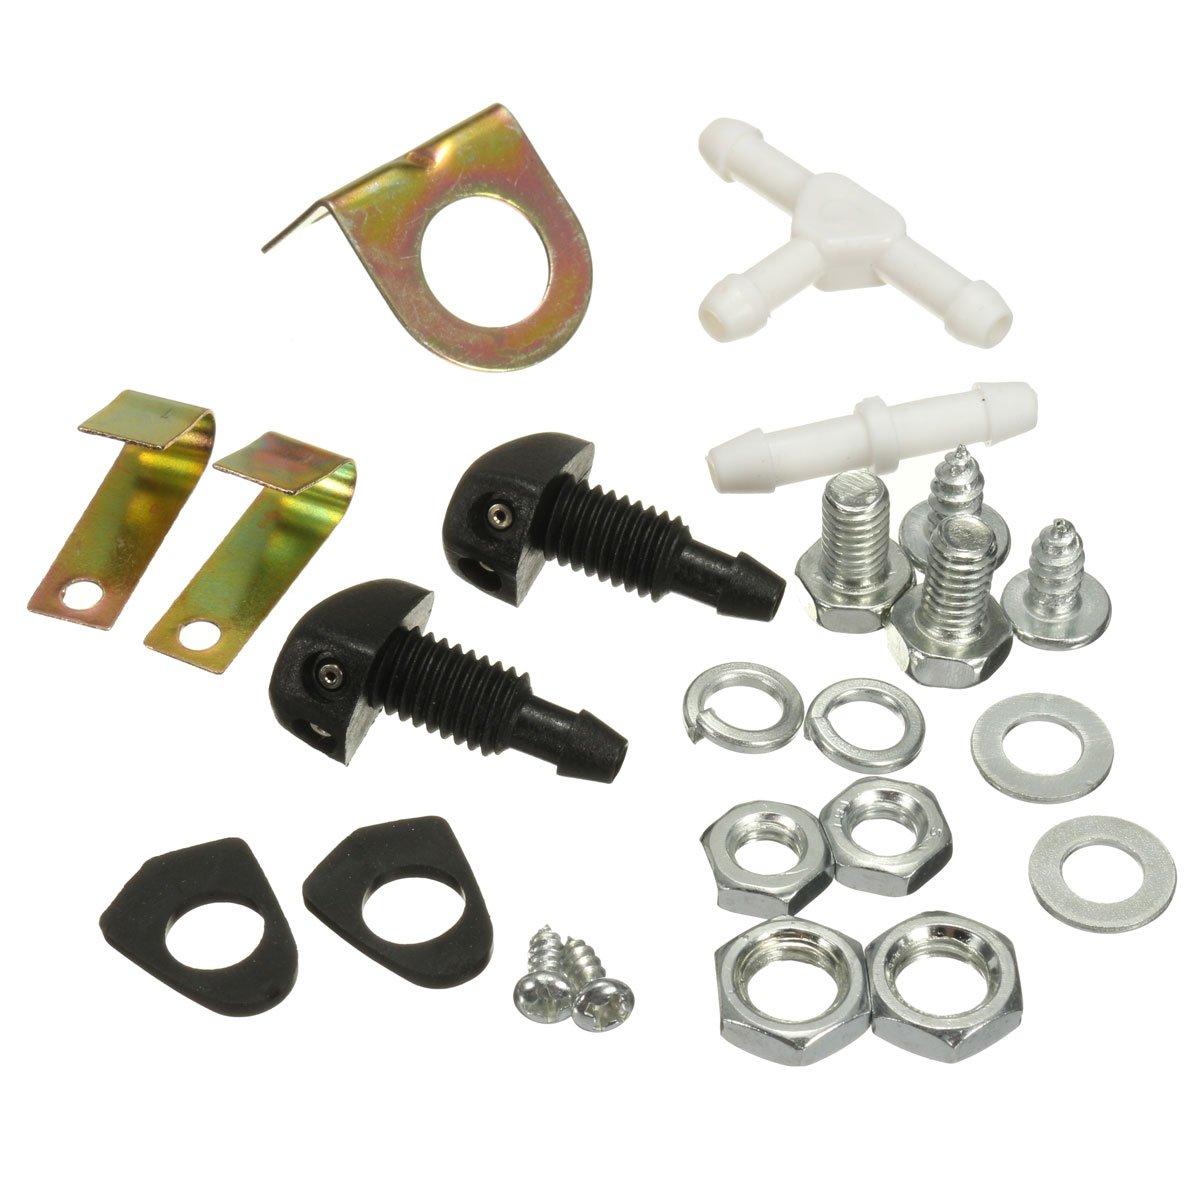 Audew 12v Universal Car Windshield Washer Pump Ls1 Diy Wiring Harness Kit Bottle System With Jet Button Switch 160186 Automotive